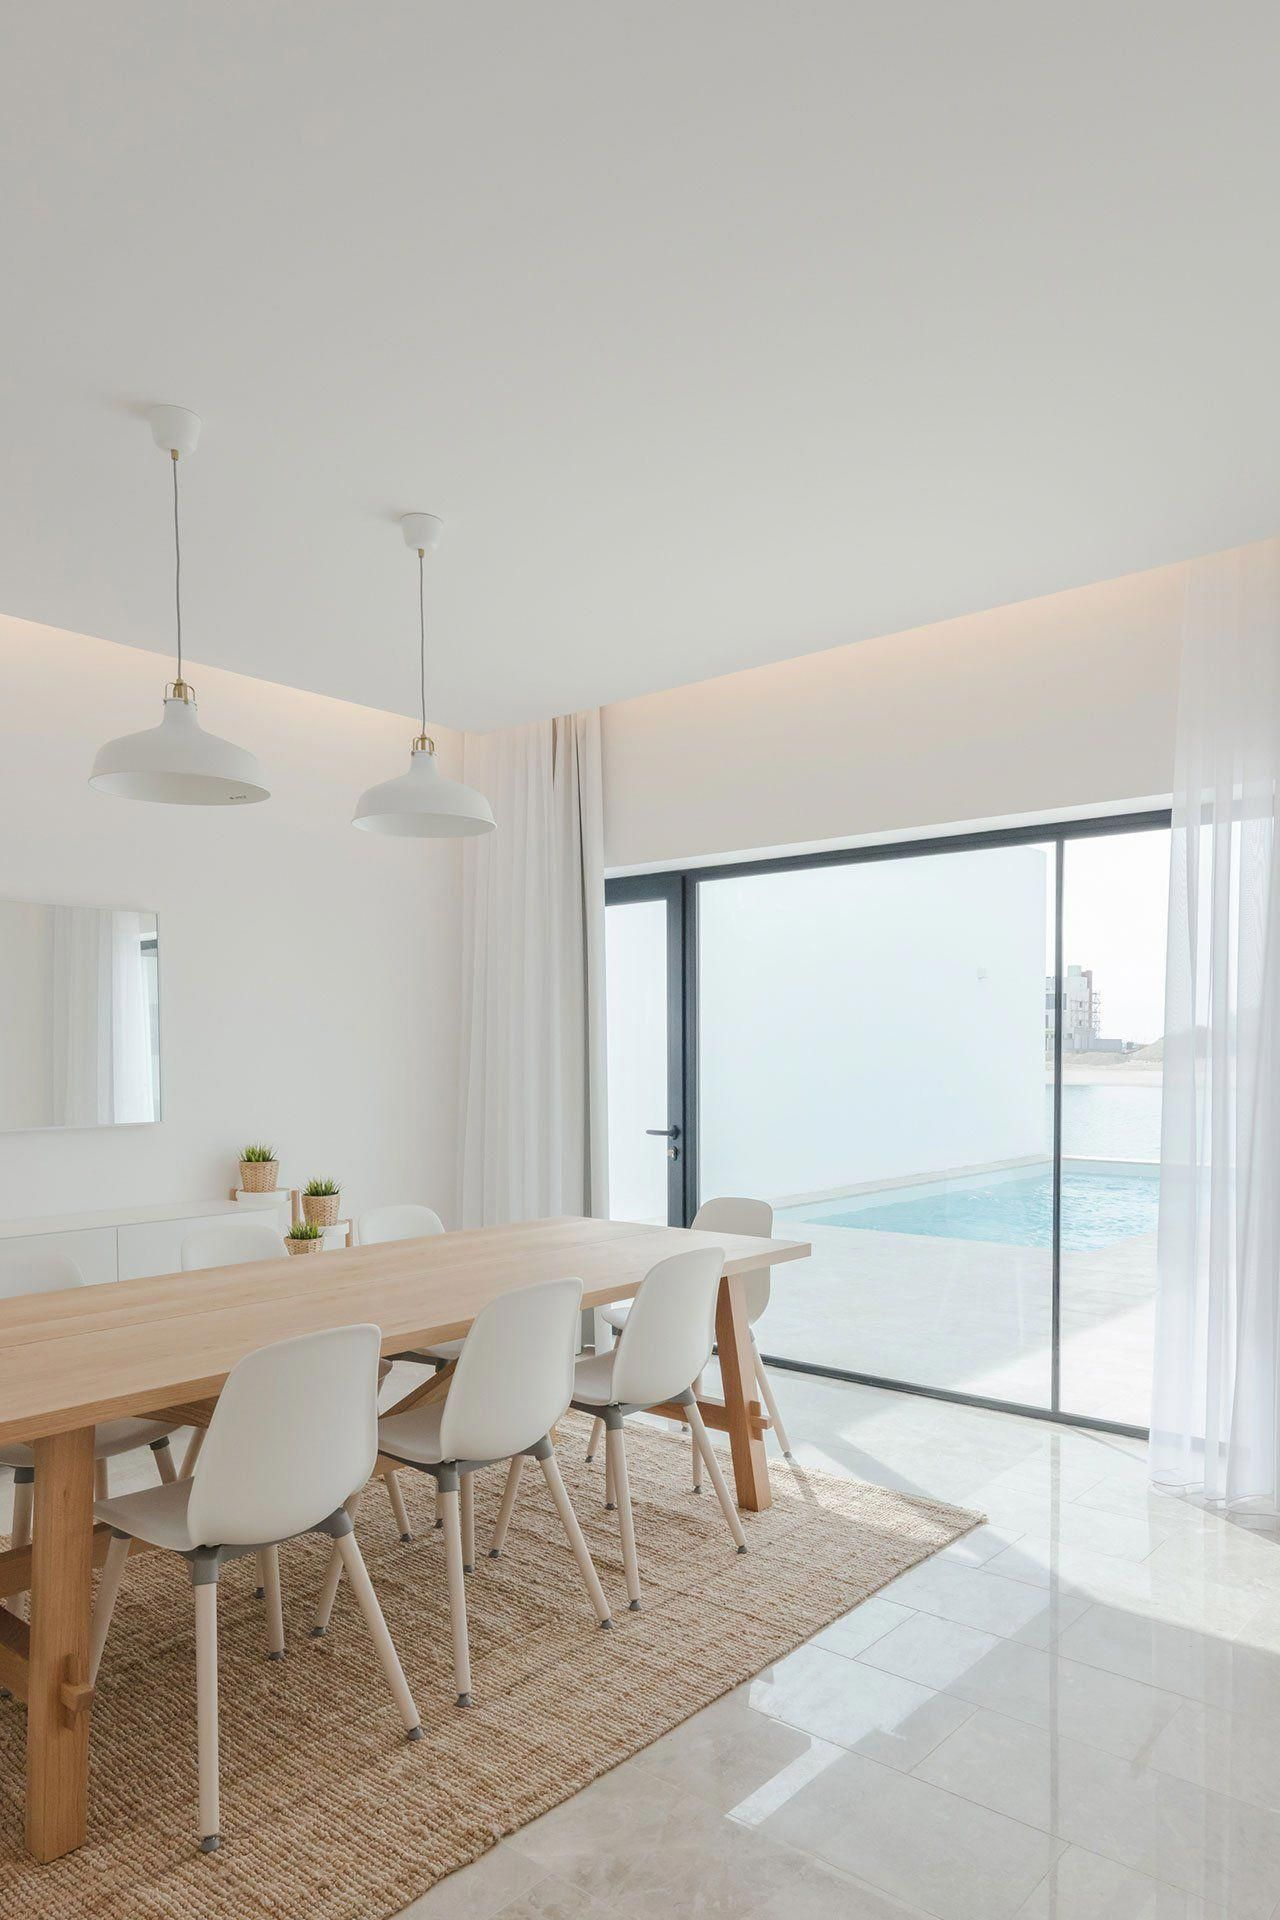 Photo joao morgado sweet home make interior decoration design ideas also rh pinterest